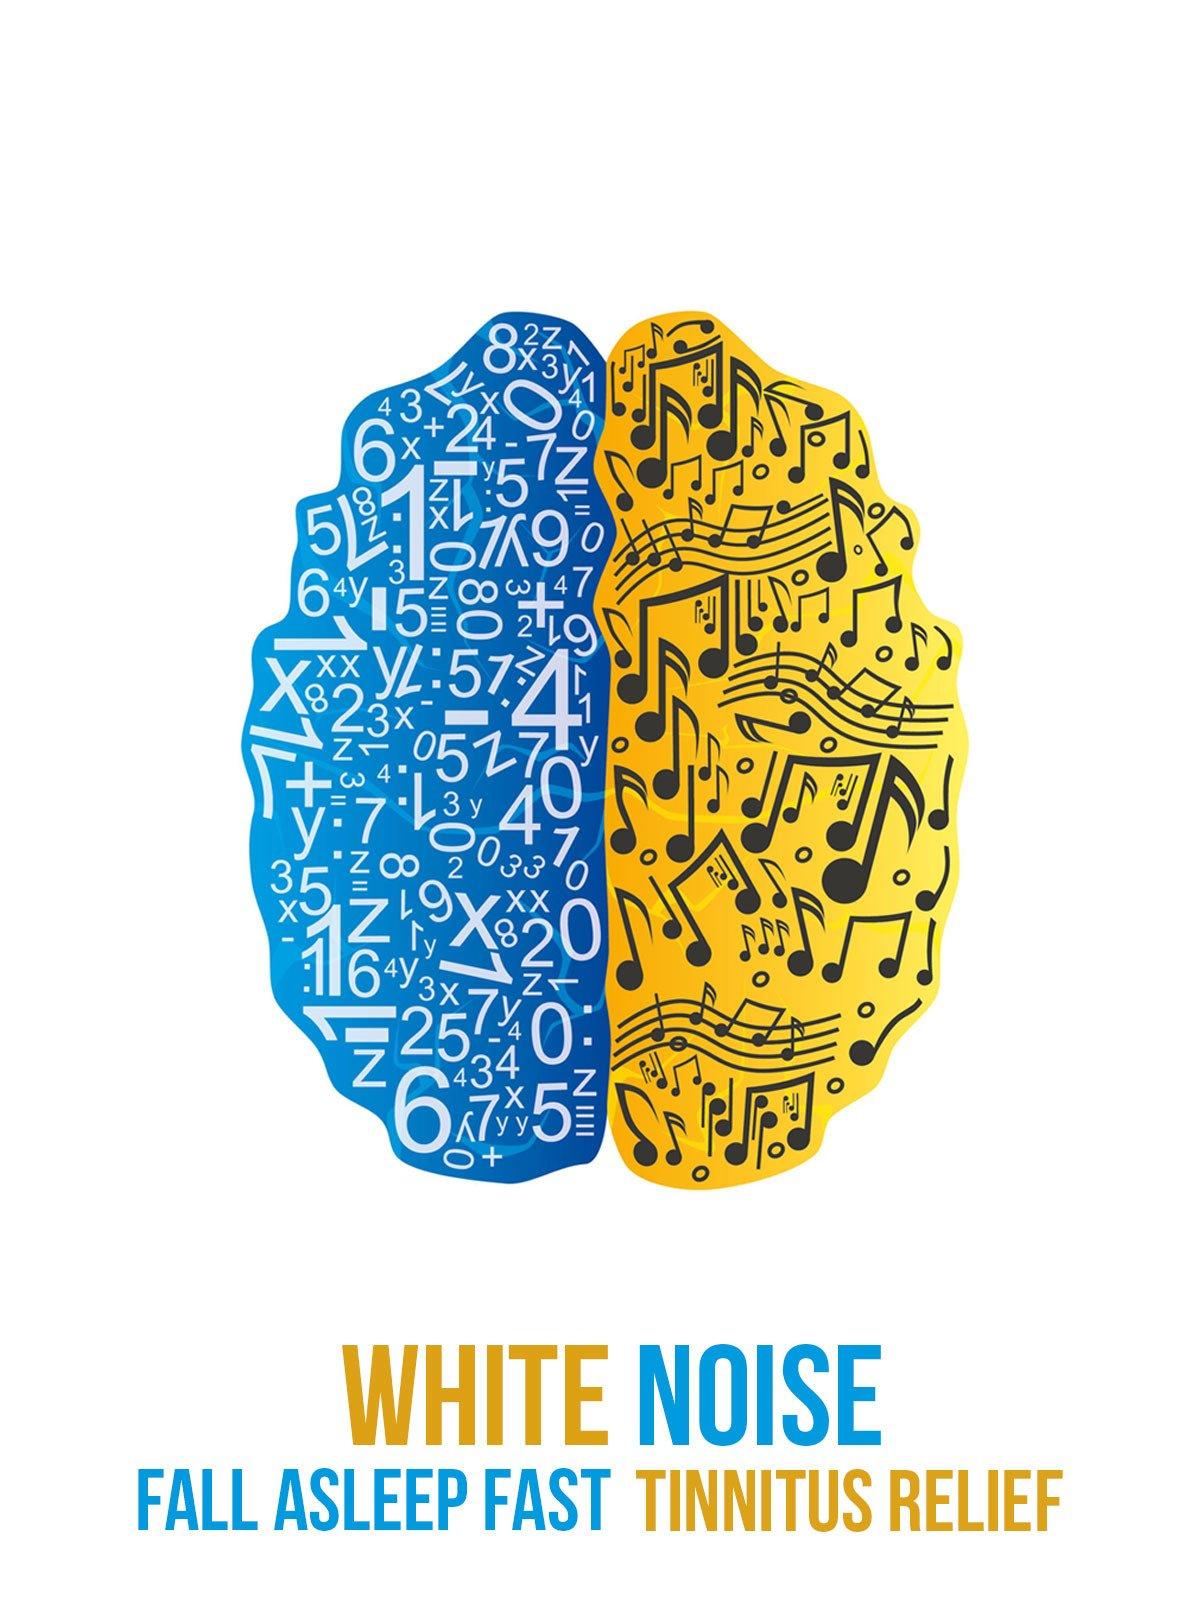 White Noise Fall Asleep Fast Tinnitus Relief